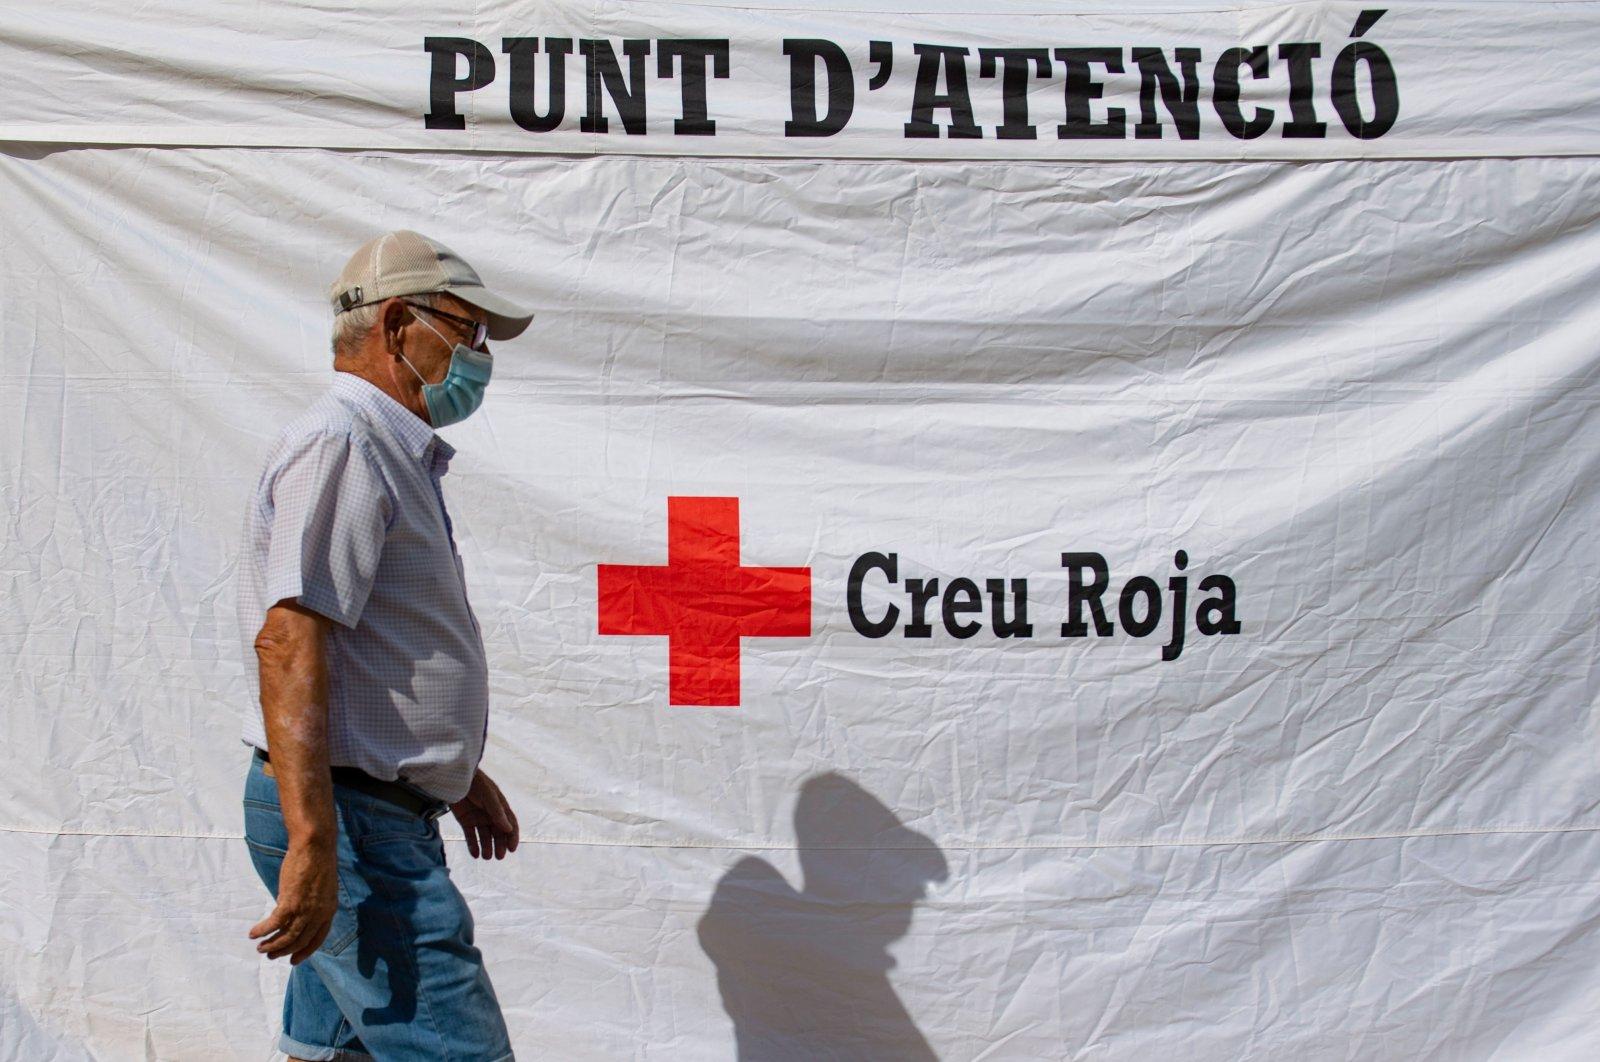 A man walks past a tent outside a medical center where people are tested for the novel coronavirus, Santa Coloma de Gramenet, Catalonia, Spain, Aug. 10, 2020. (AFP Photo)